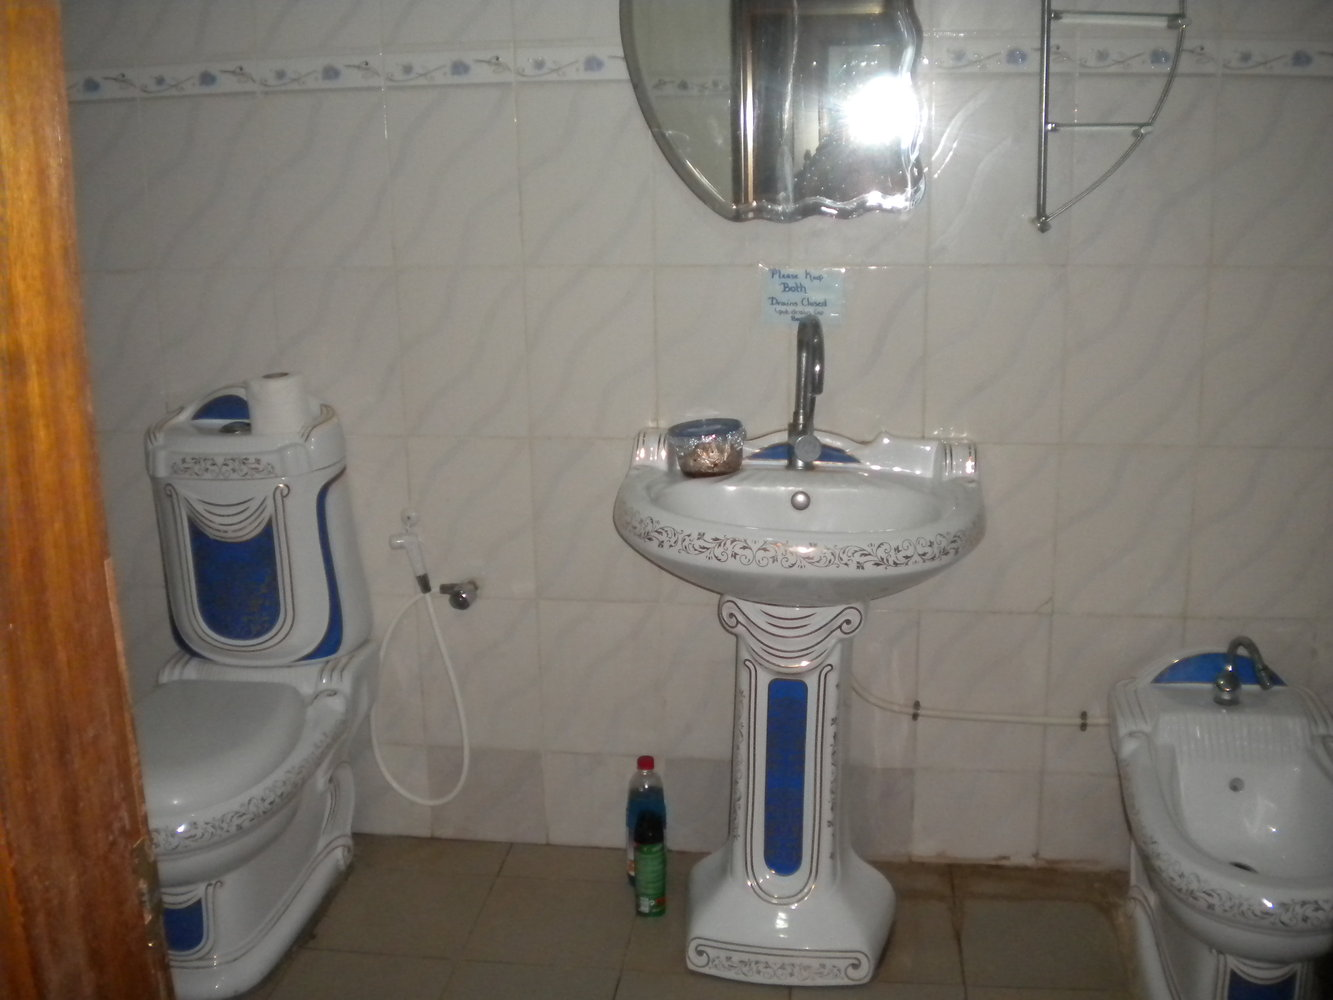 Senegalstyle Budget B Amp B Hostel Amp Group Accommodation